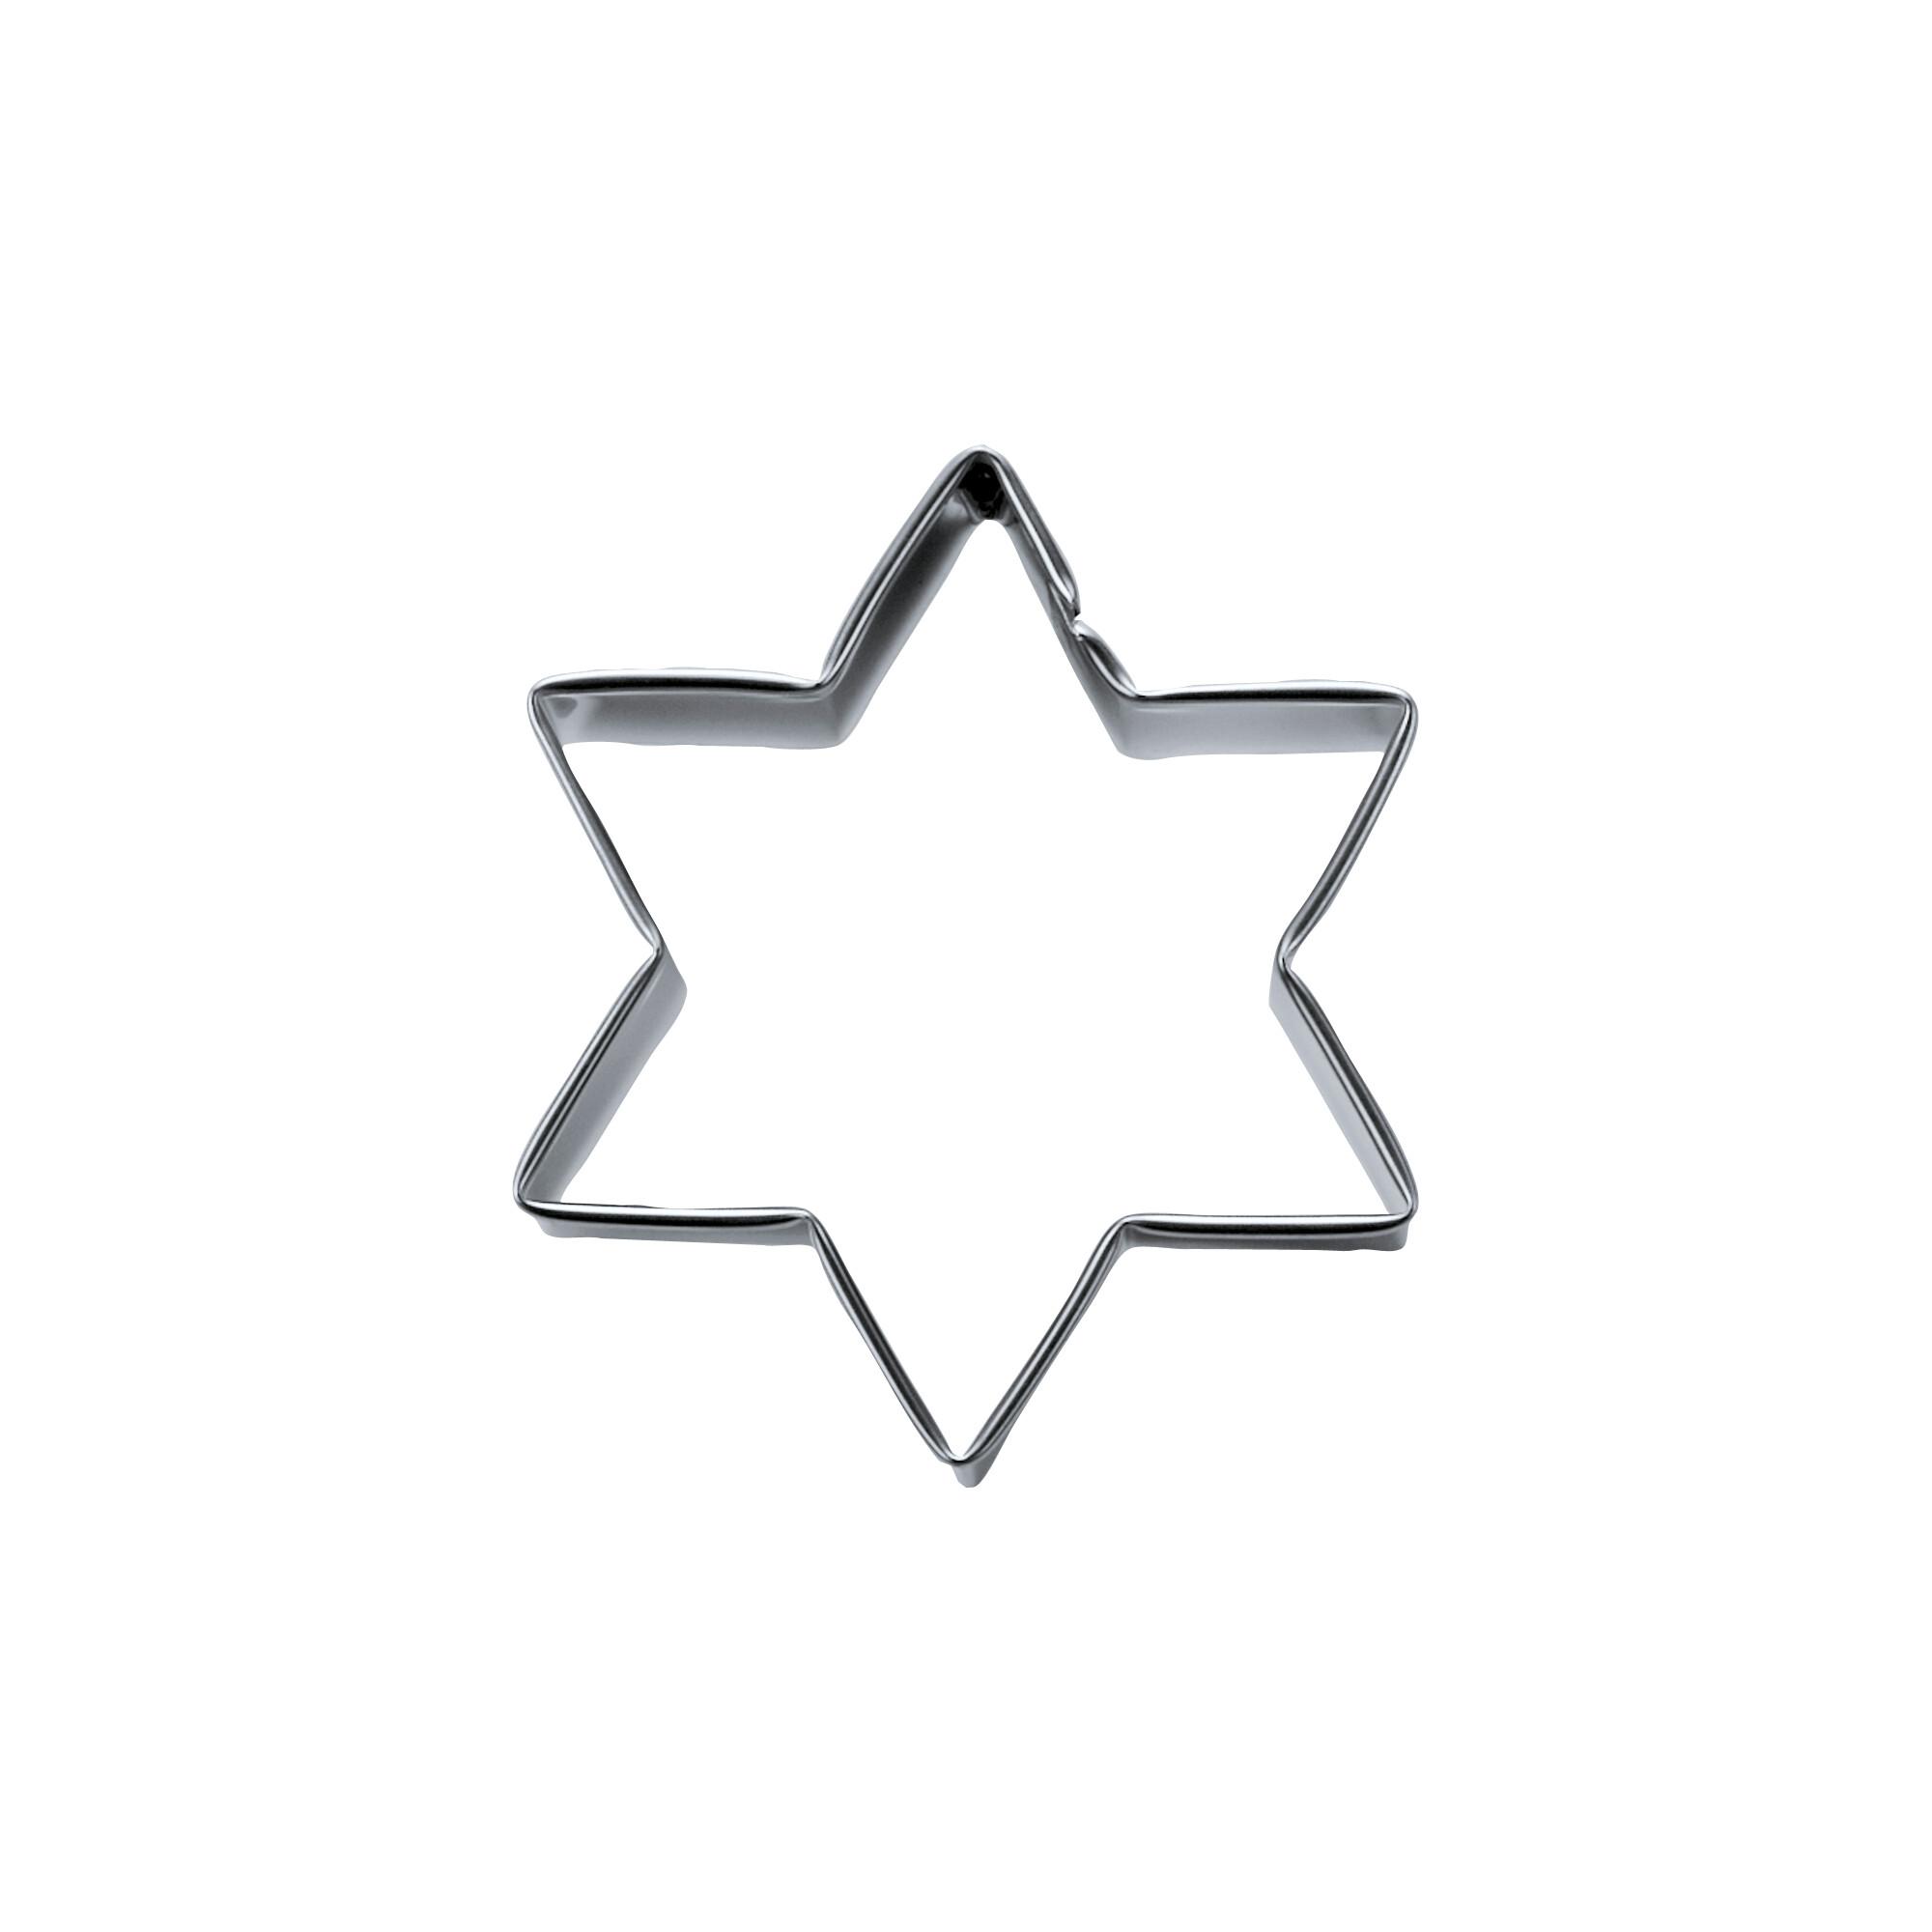 Ausstecher - Stern - 6-zackig